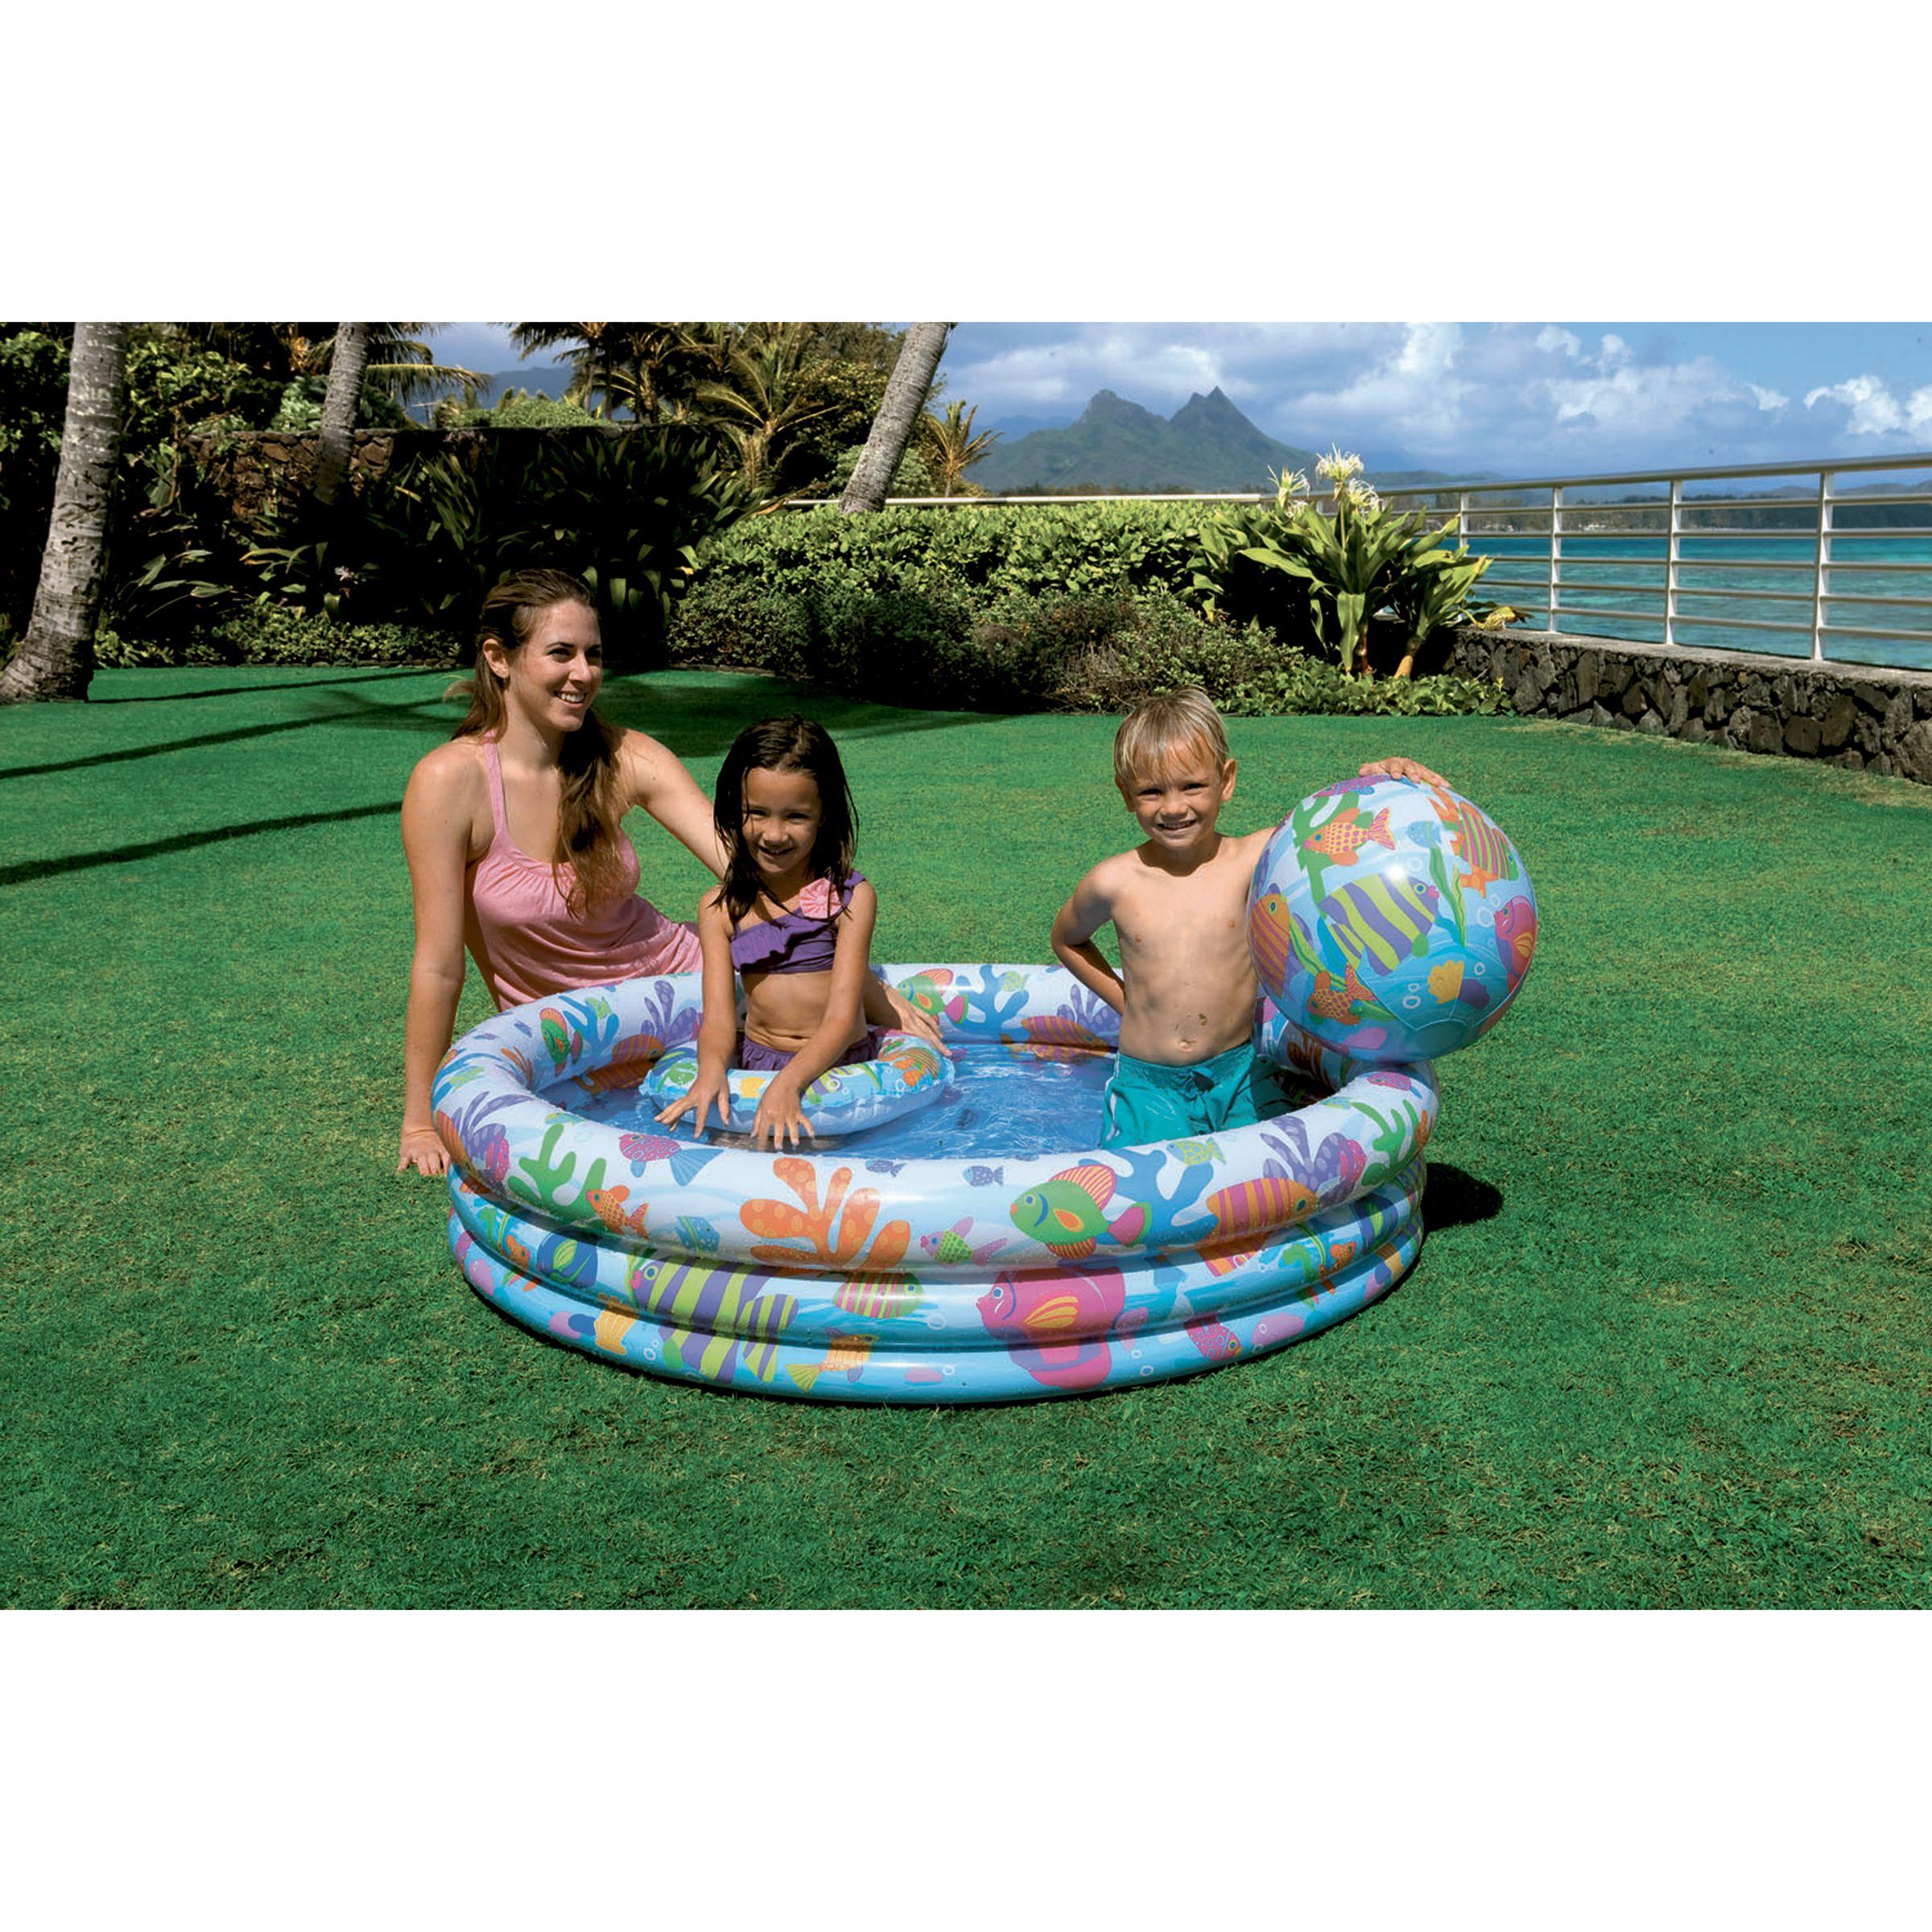 Intex Fishbowl Paddling Pool Set